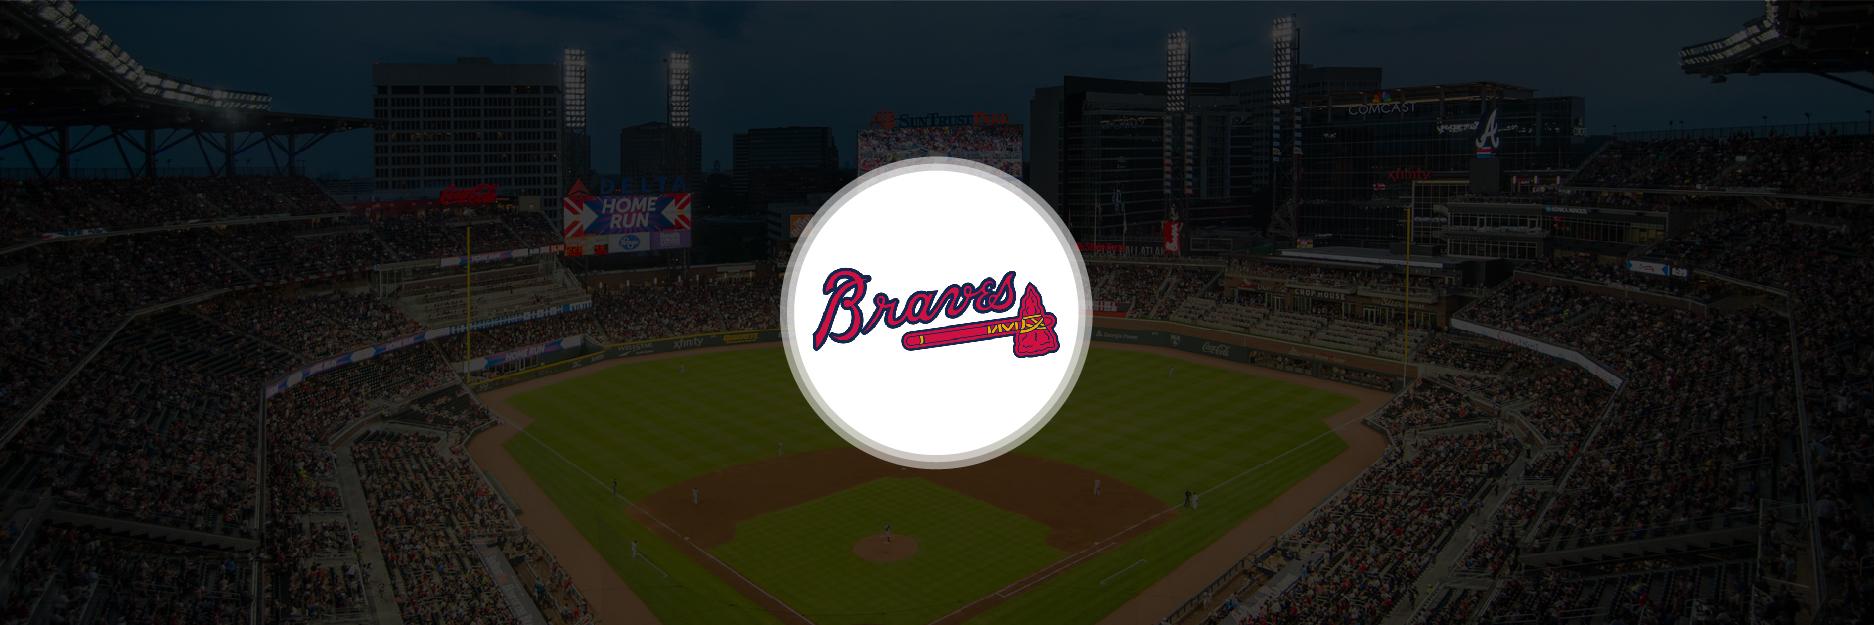 Atlanta Braves 2020 Season Analysis